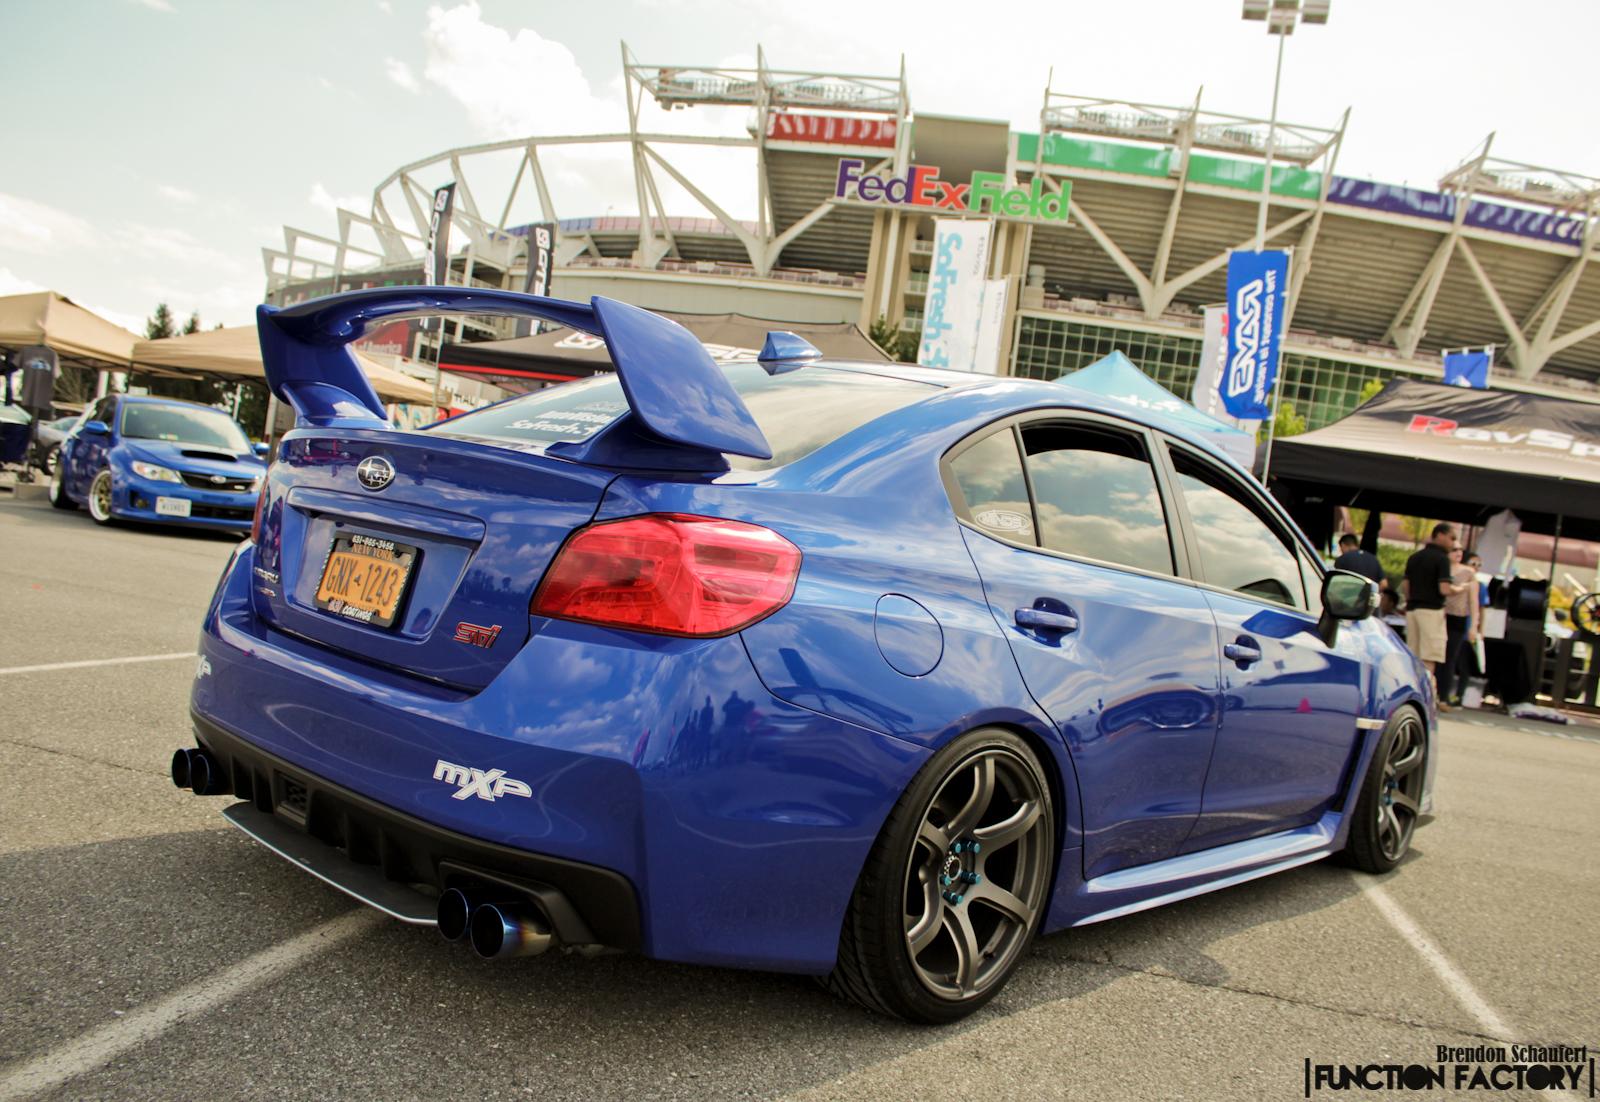 2015 Subaru STI   Trackday Thursday   Function Factory